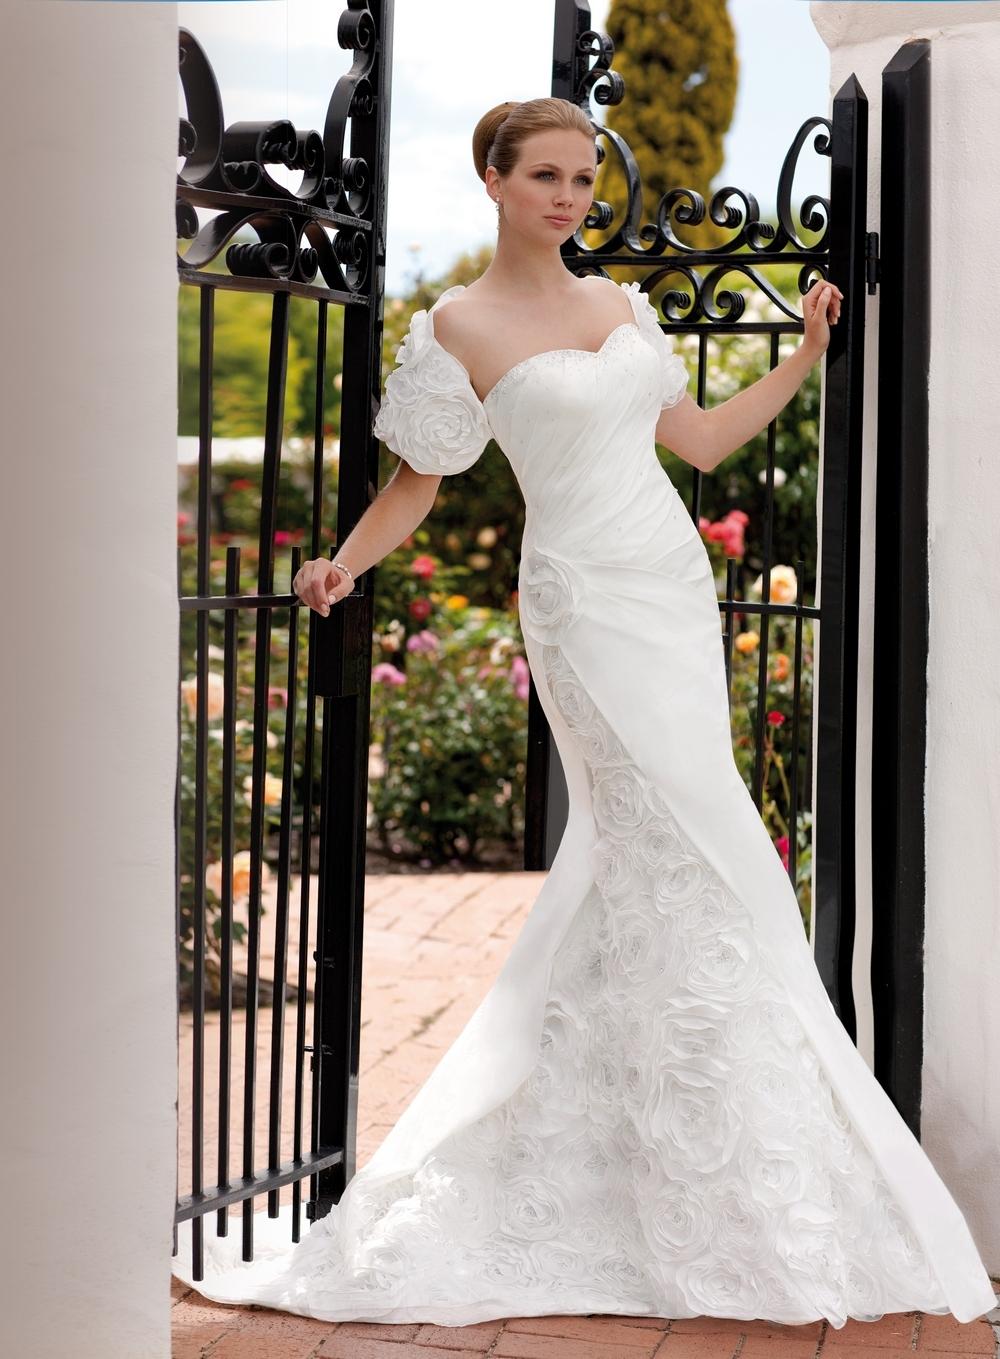 Petite Curvy Romantic Sweetheart Taffeta Tall Updo Wedding Dresses White Australia Essense Of